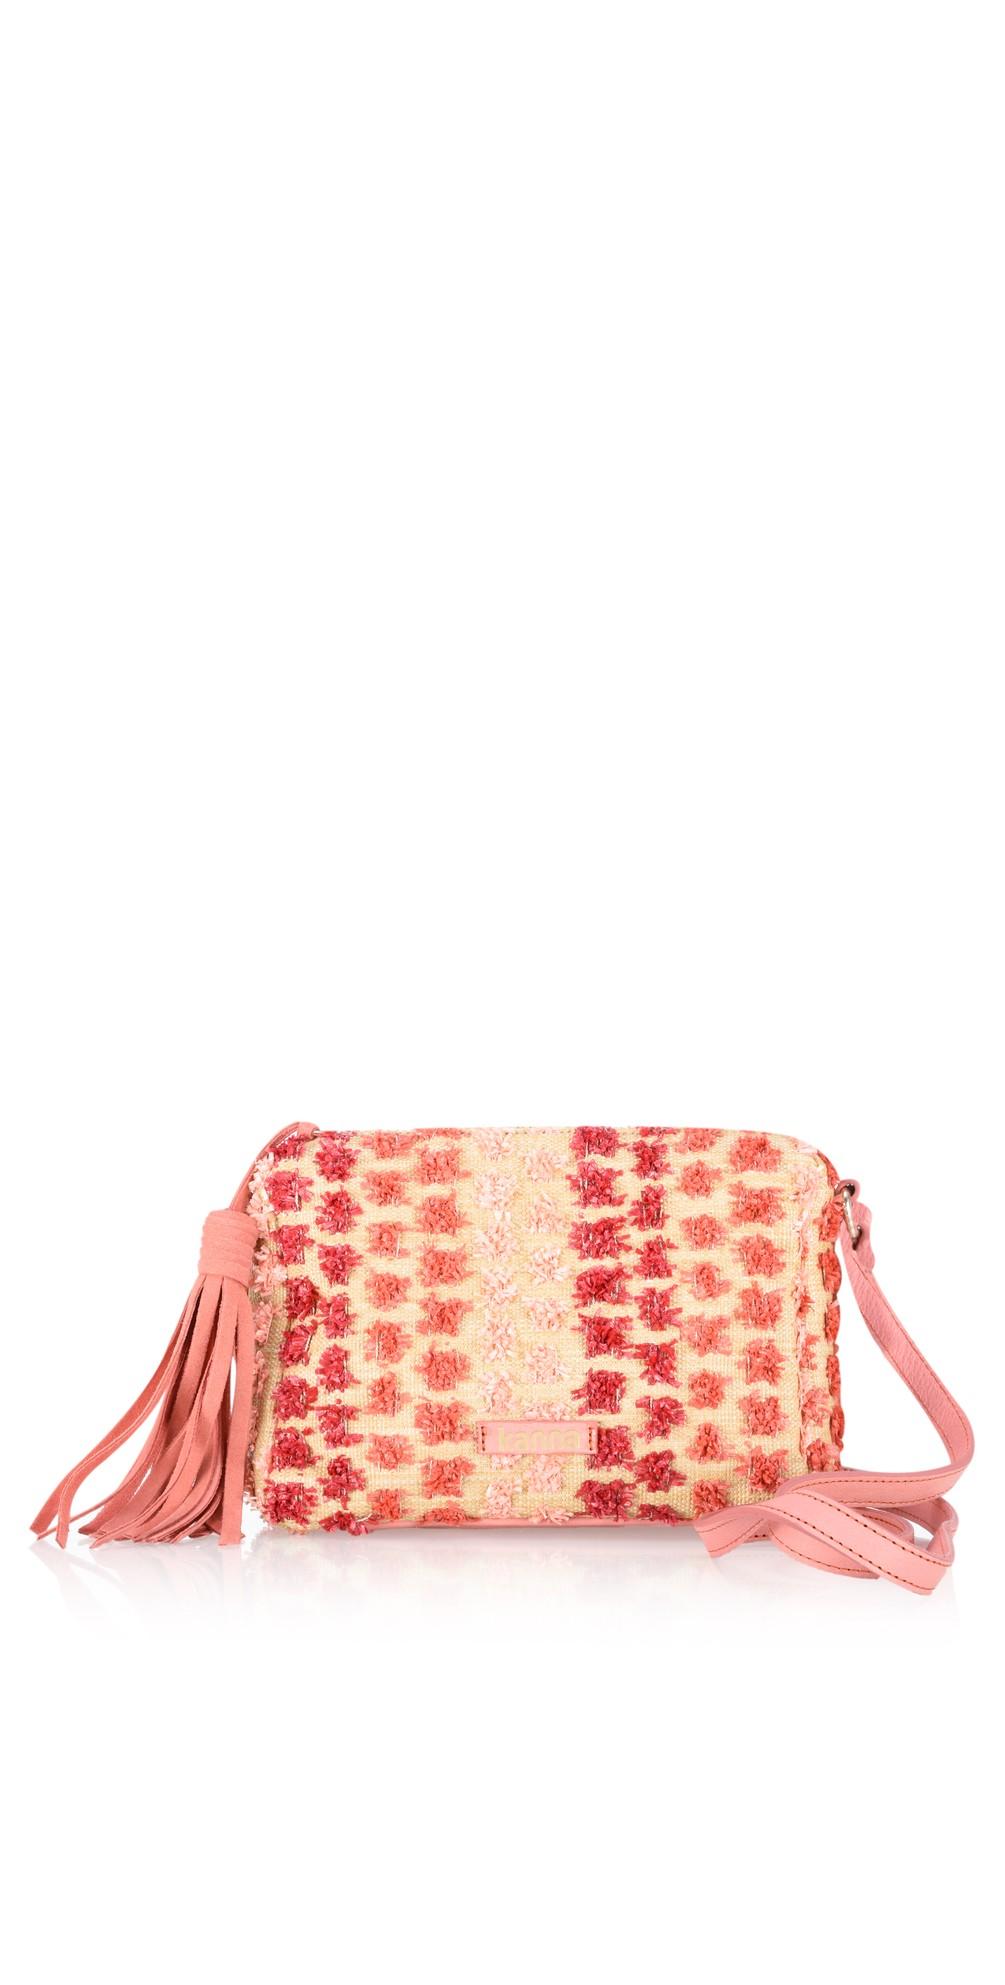 Merni Dot Cross Body Bag main image